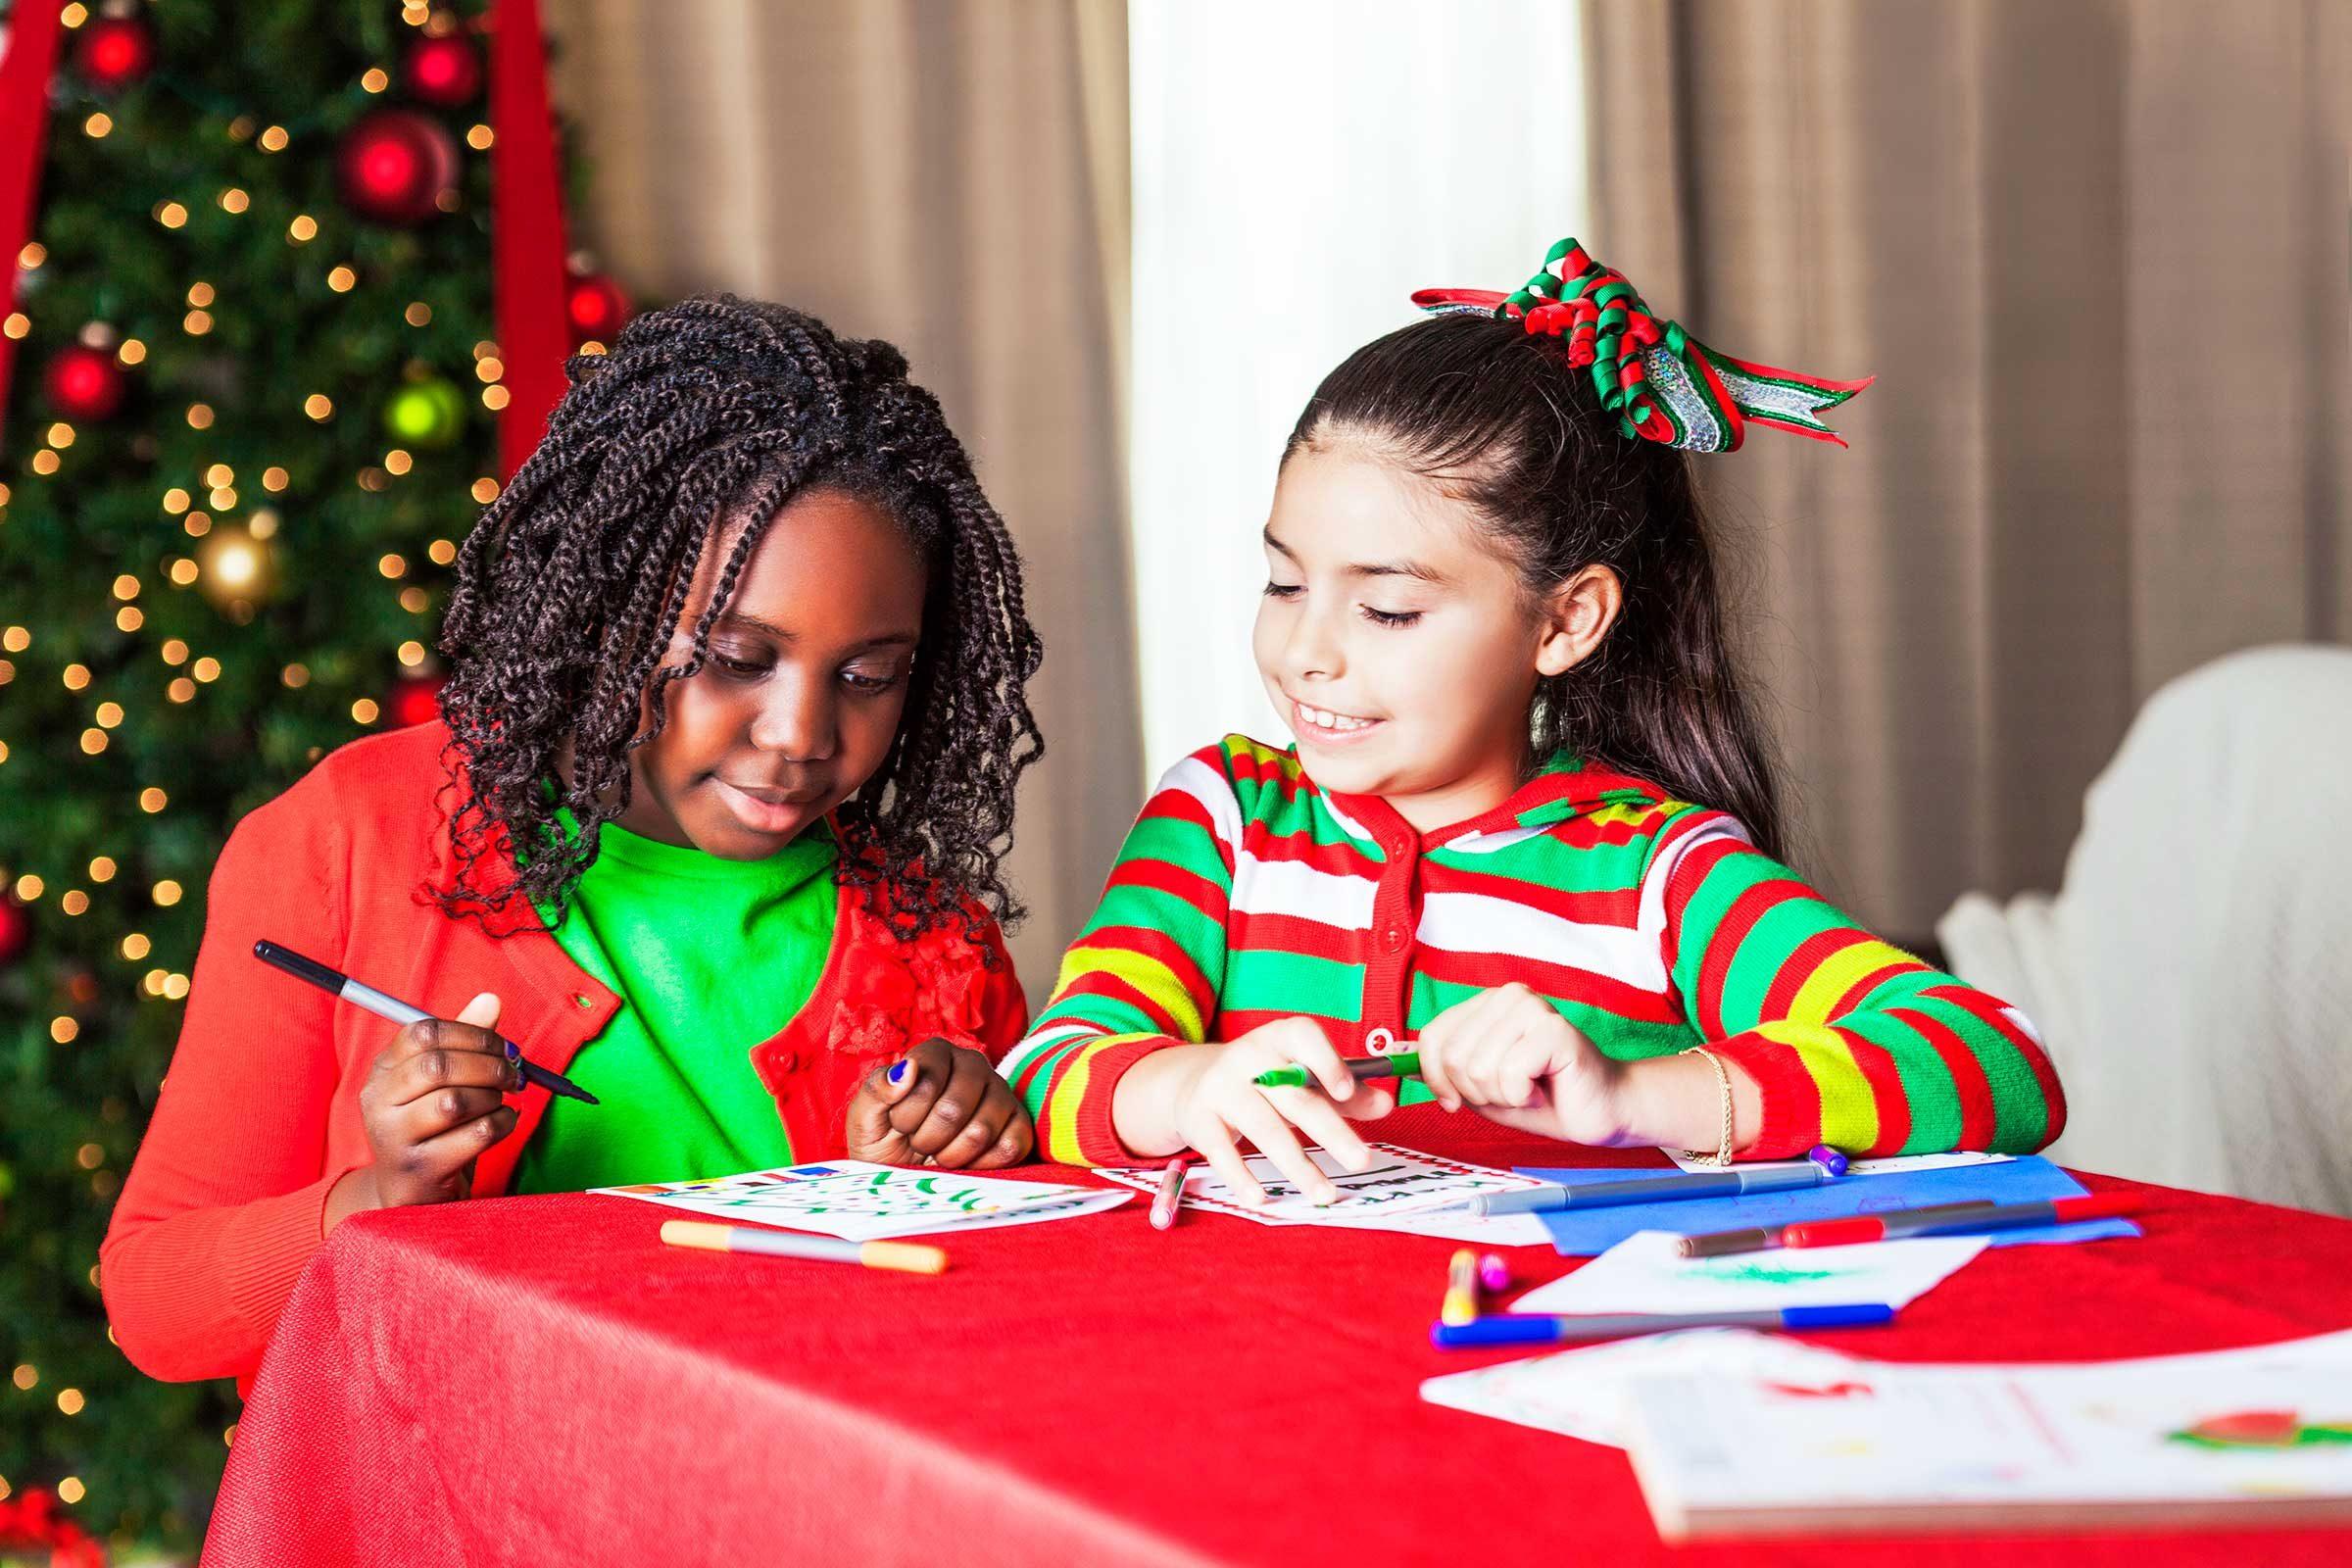 istocksteve debenport - Kids Santa